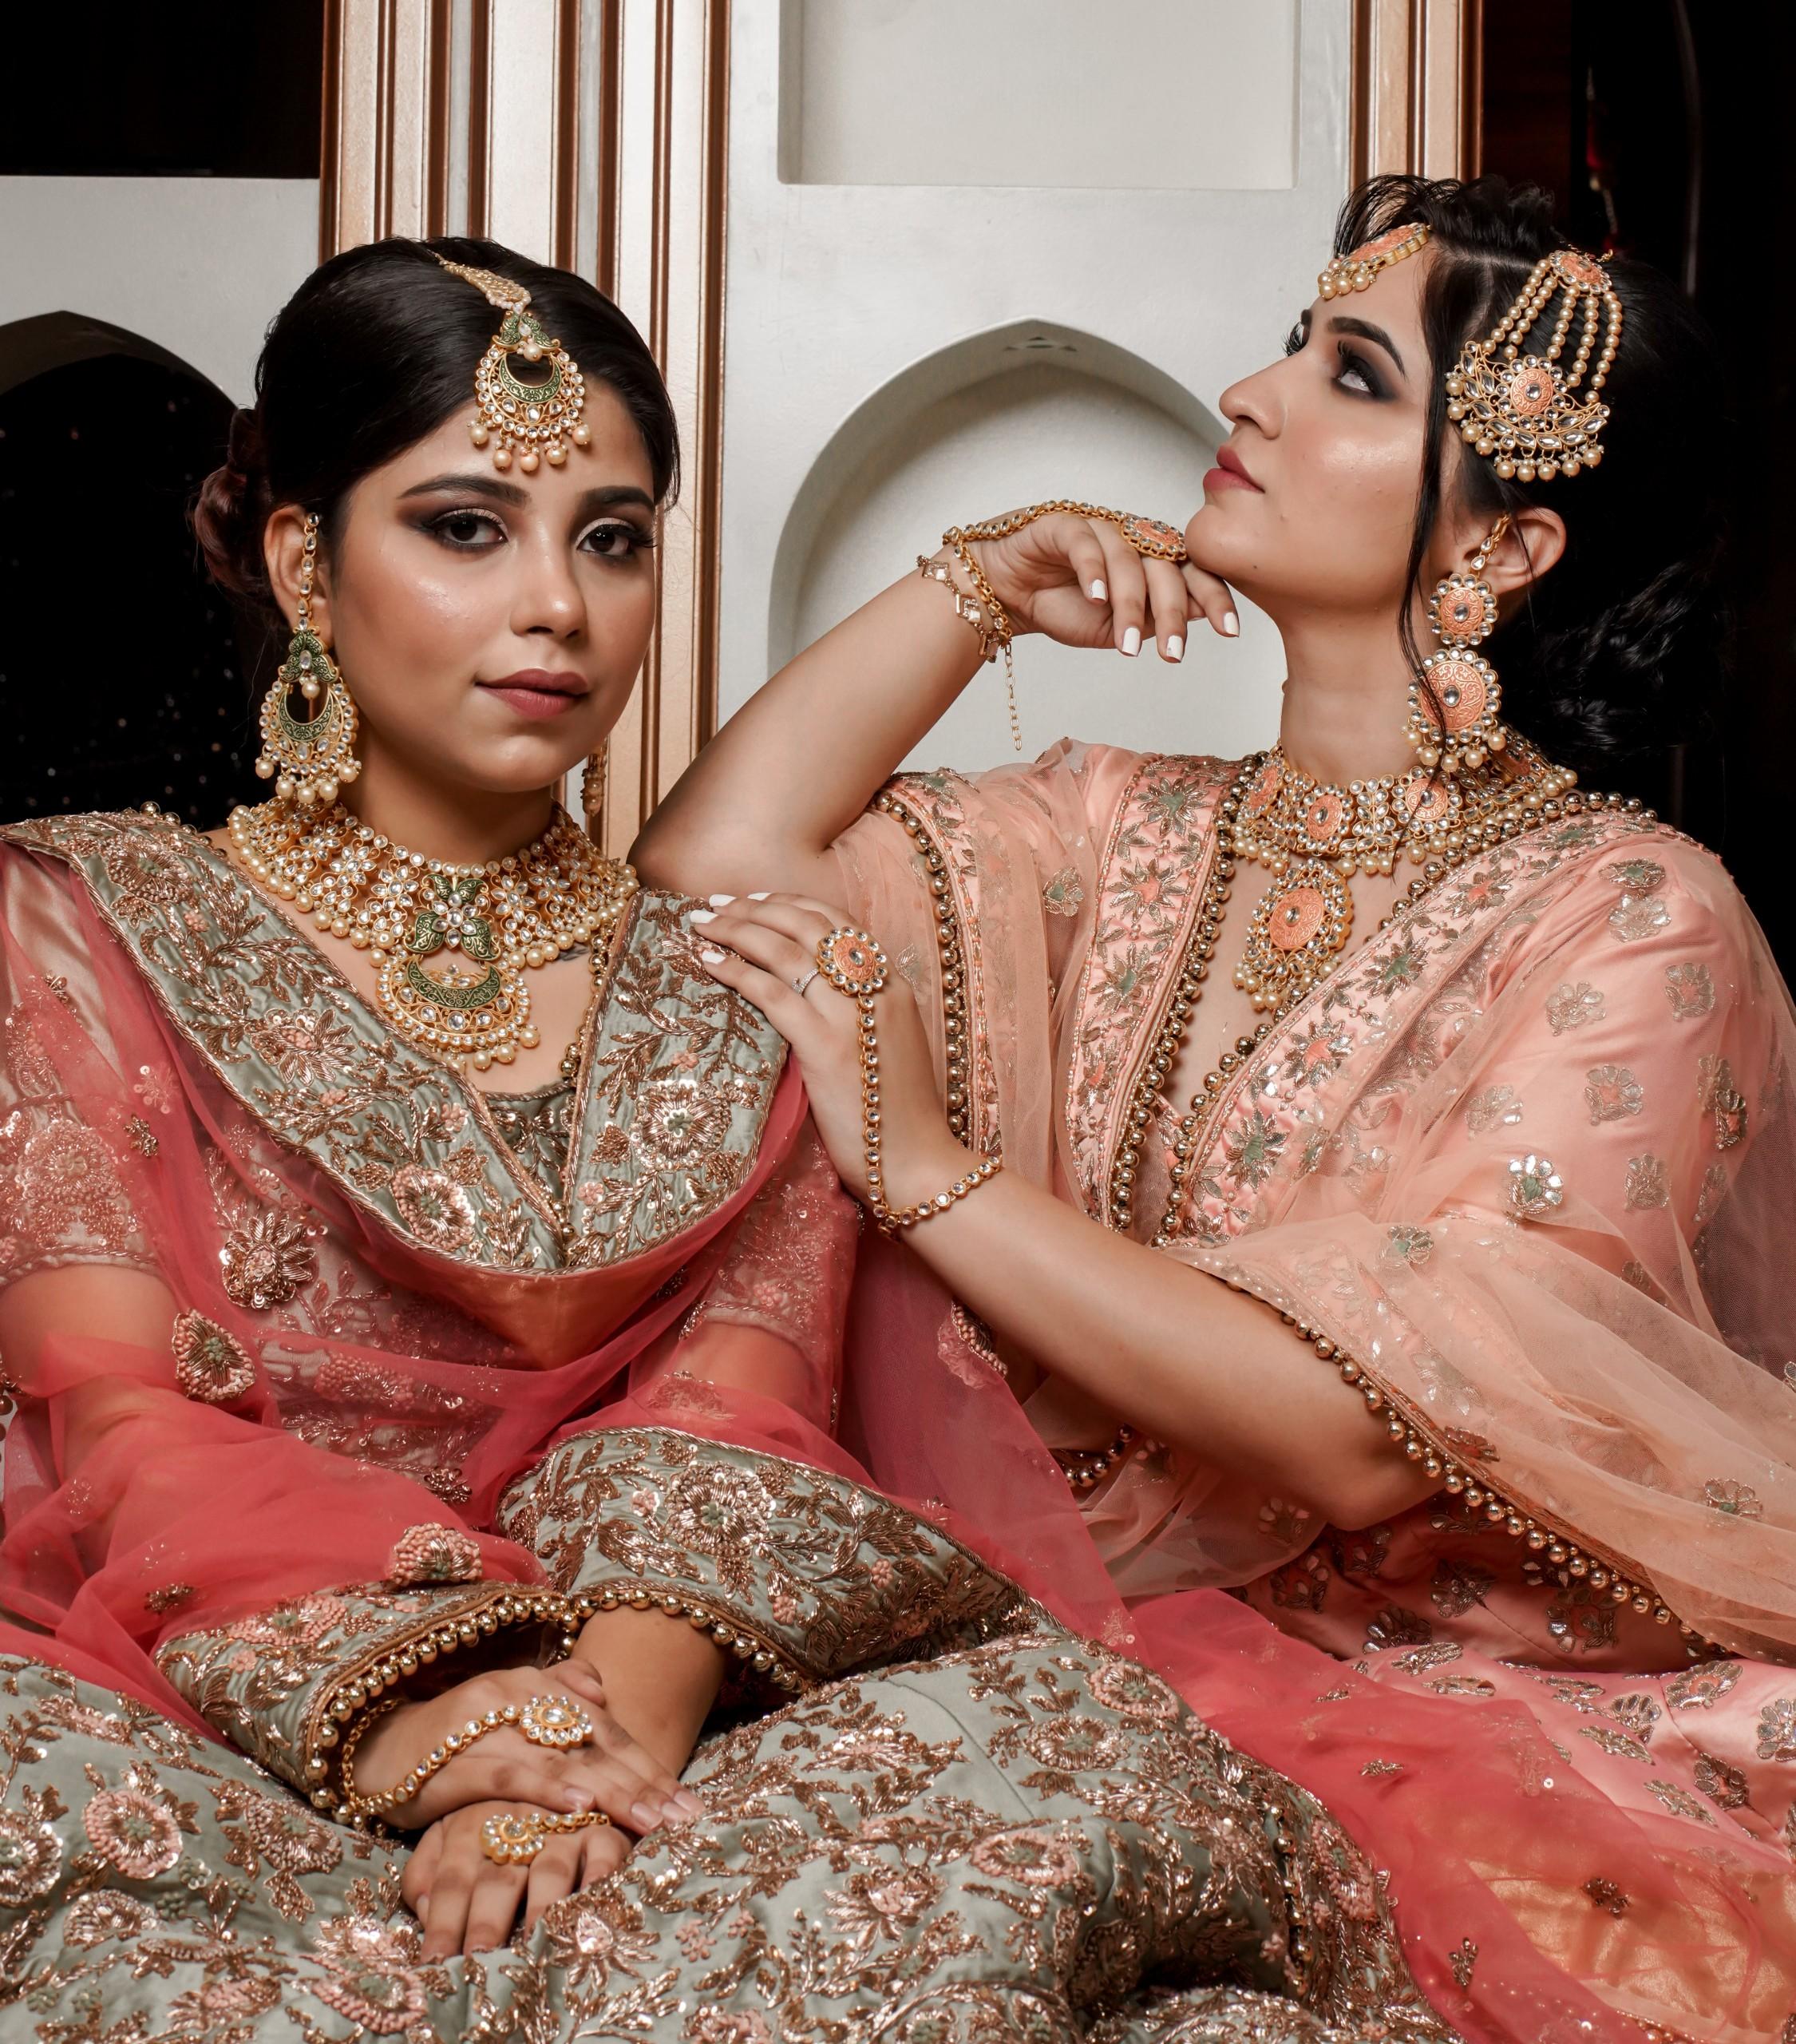 Beautiful Indian culture girls